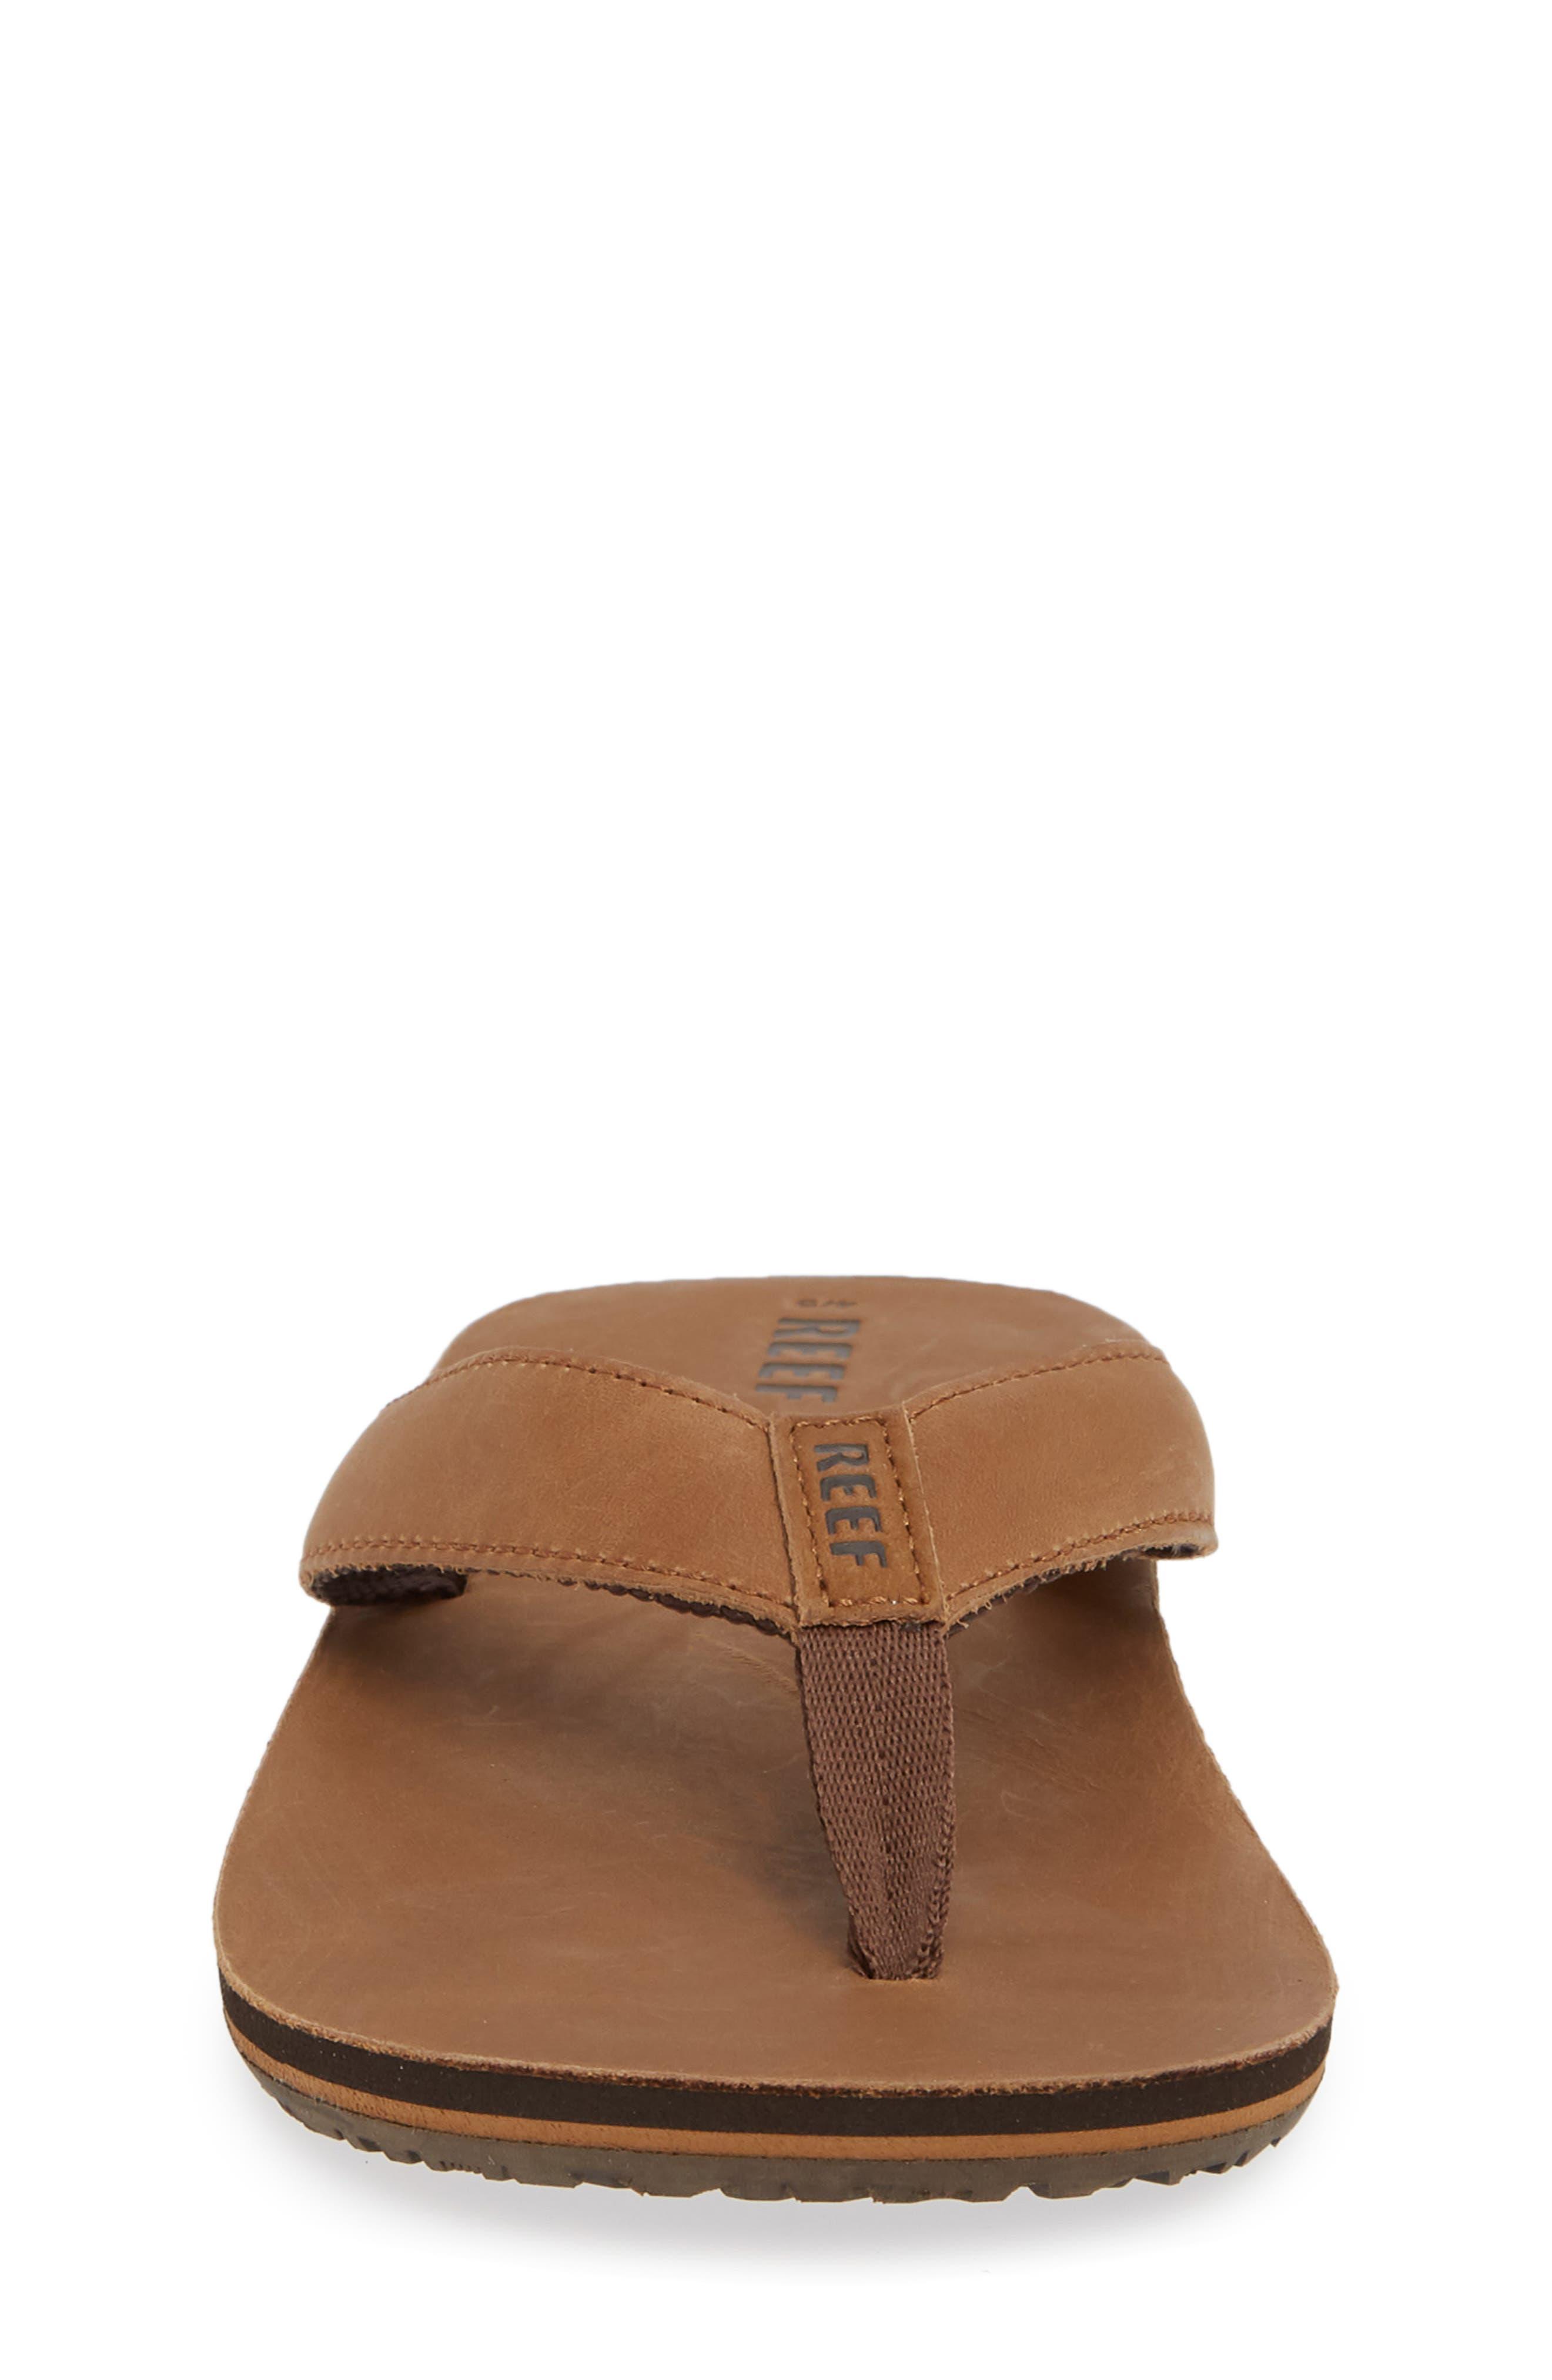 'Grom' Leather Flip-Flop,                             Alternate thumbnail 4, color,                             200